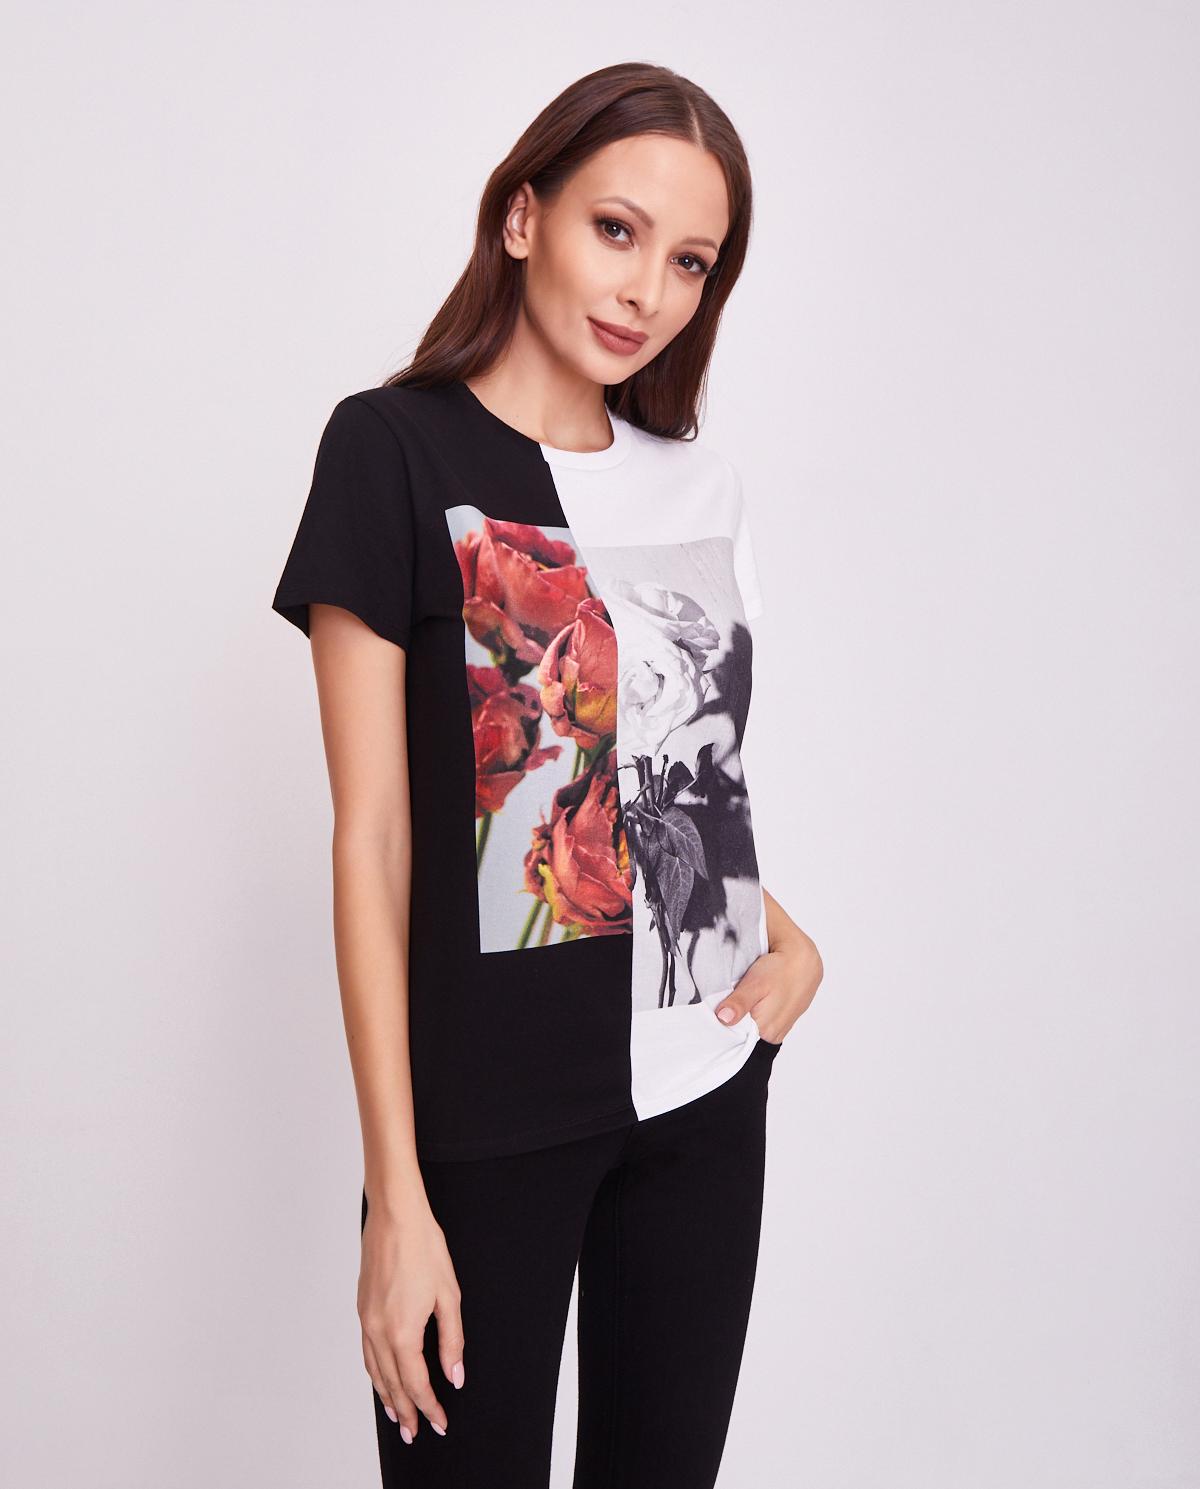 Dwukolorowy t-shirt z logo Alexander McQueen 610881 QZAAY 0520